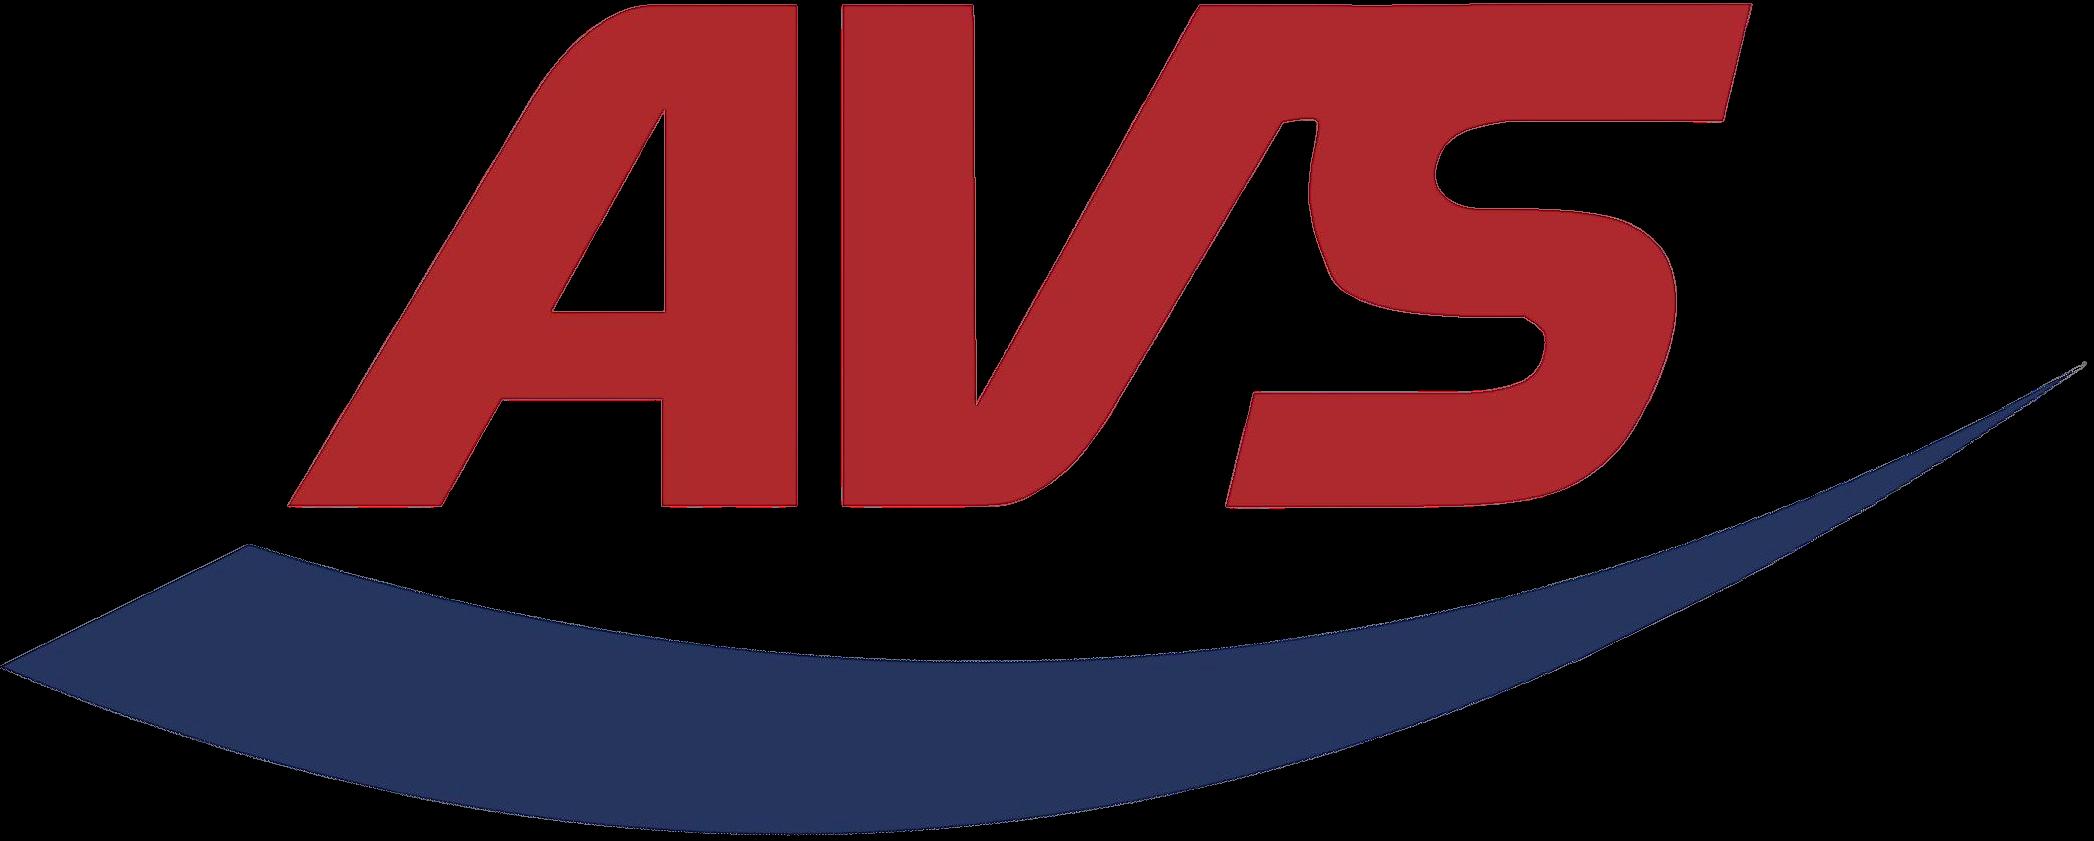 american valet services logo